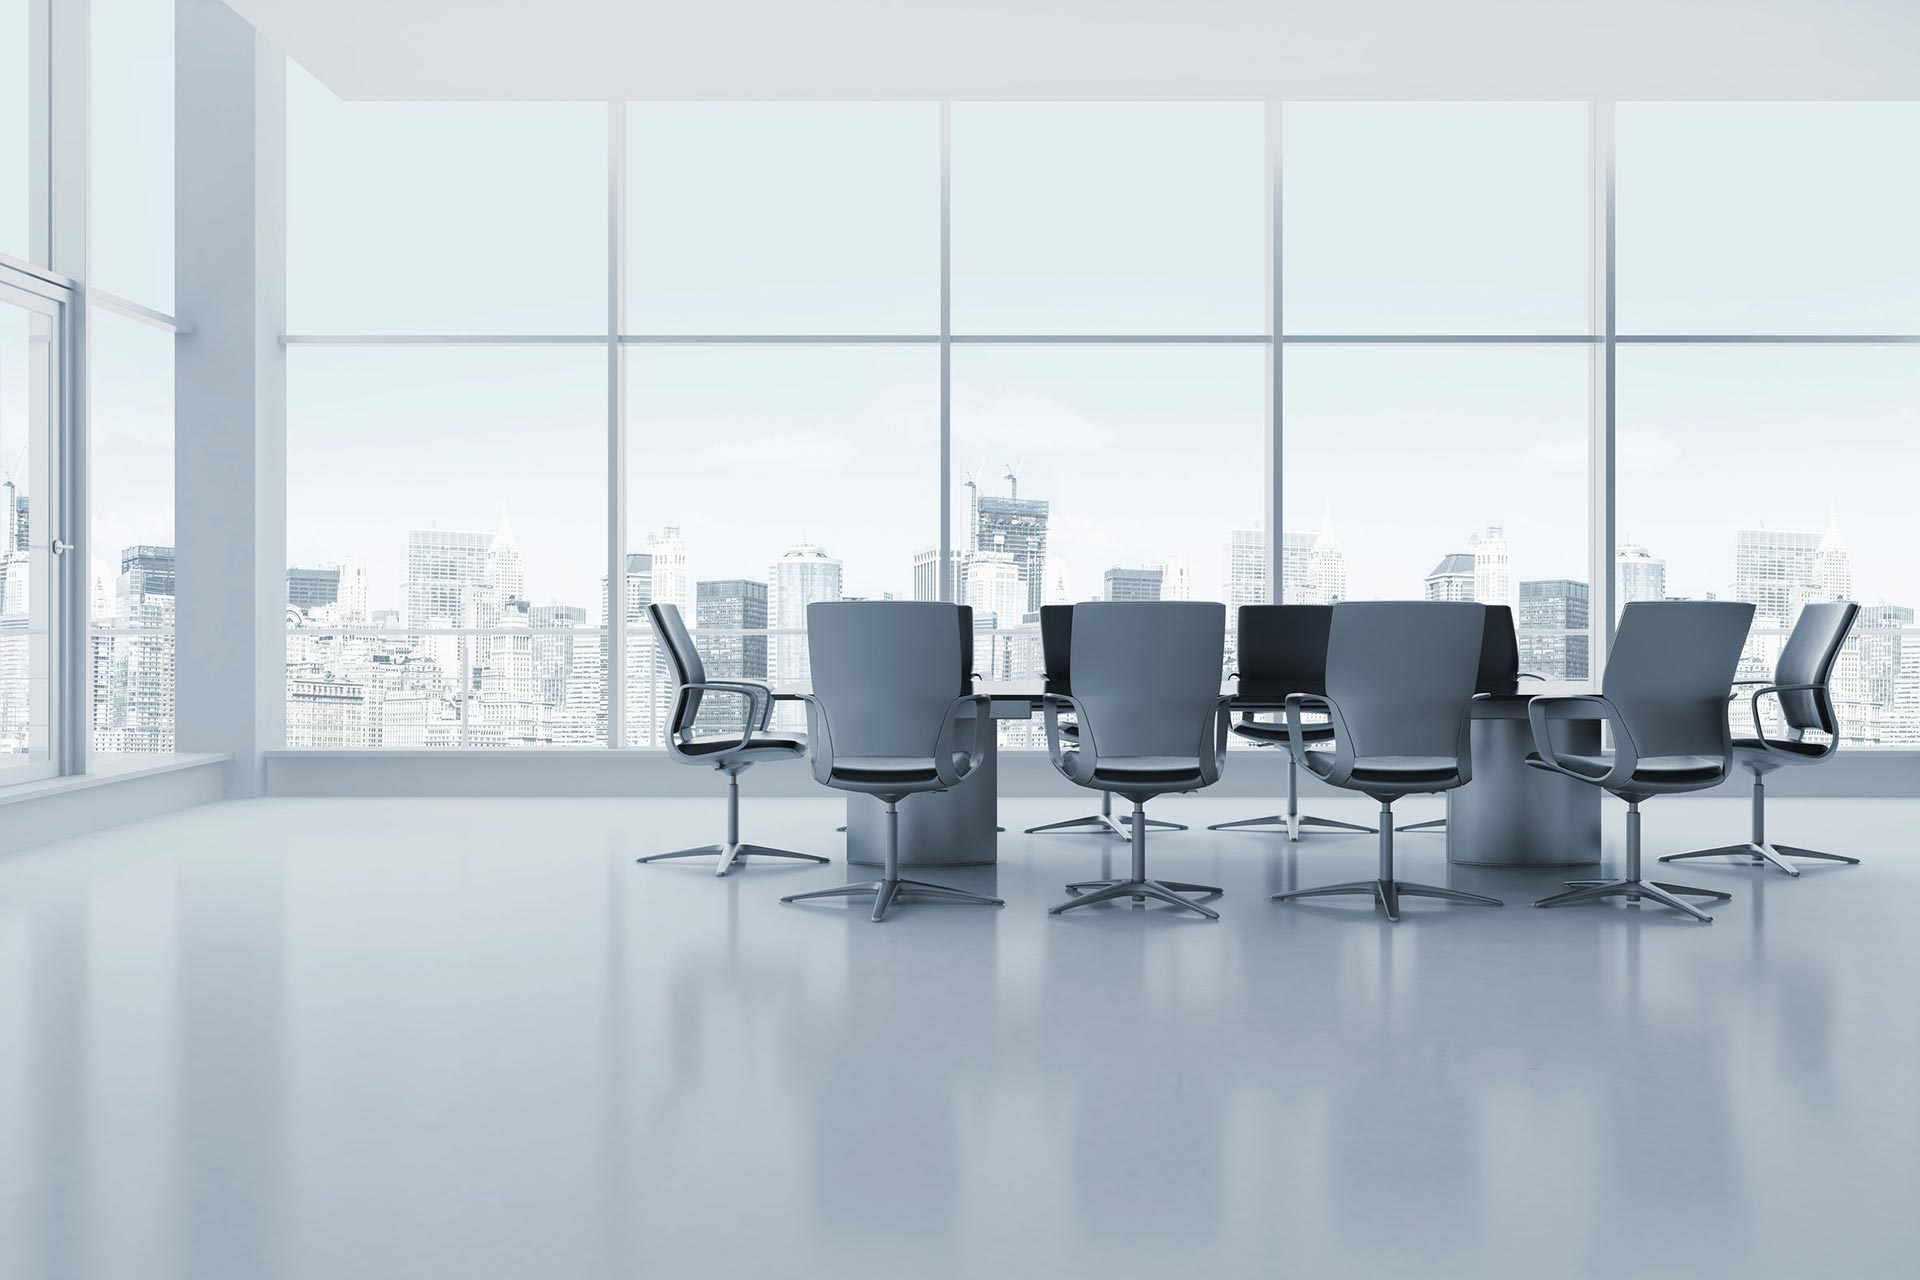 Raumverwaltung Management Software